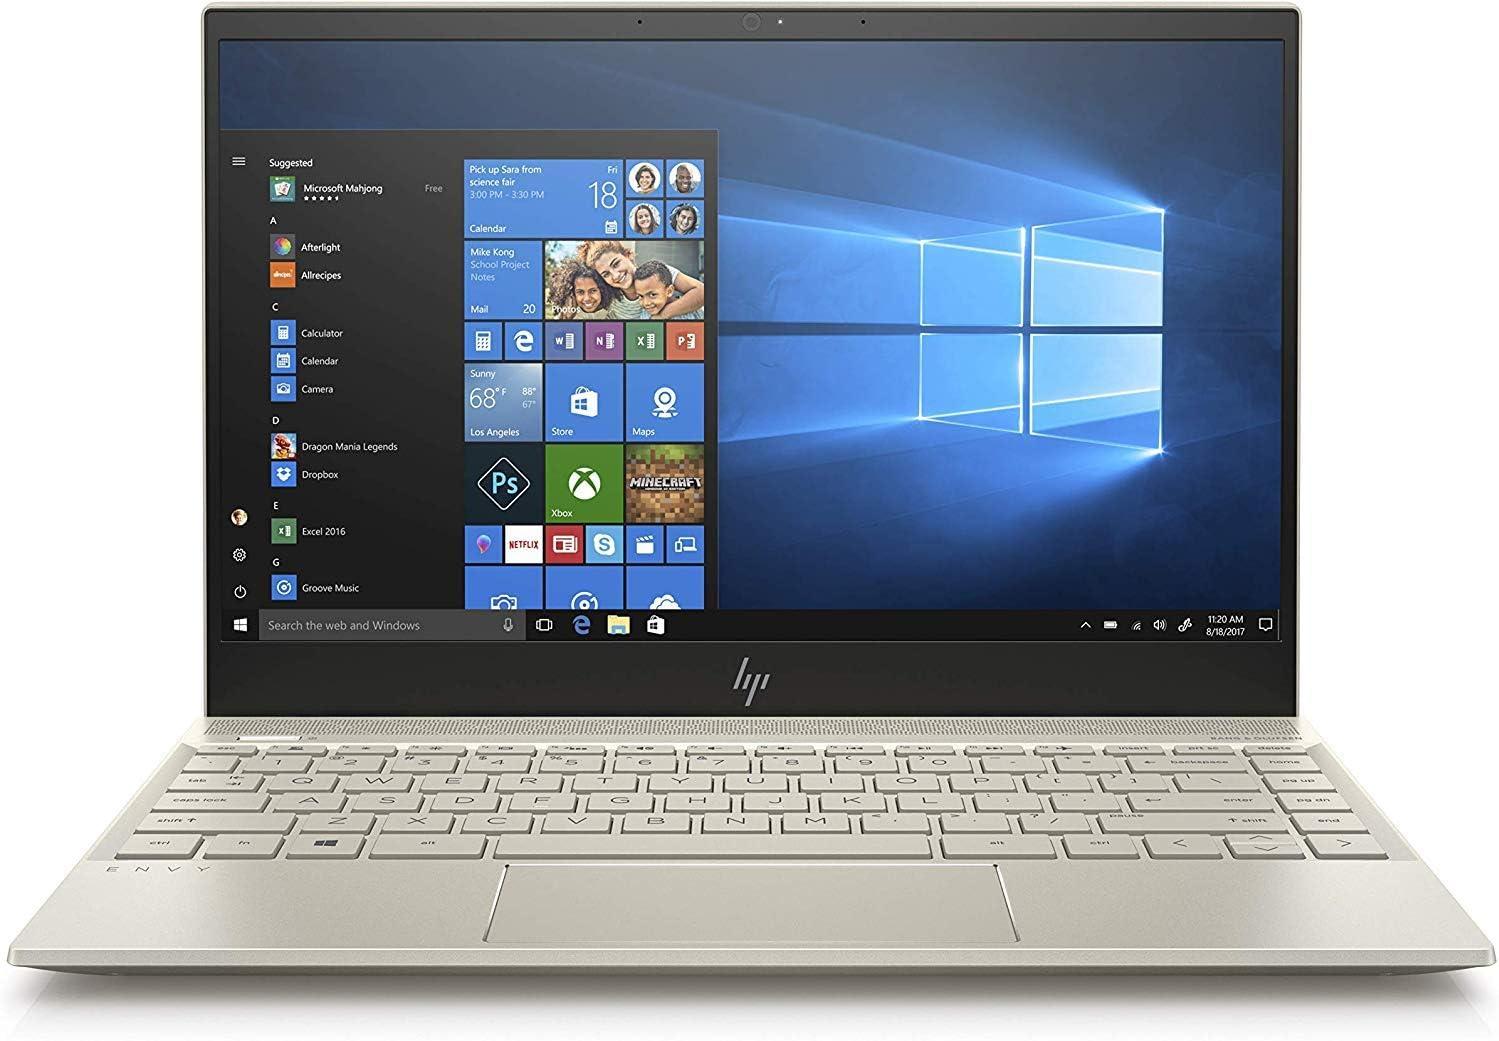 HP Envy High Performance Business 13.3in Full HD Laptop, Intel Core i5-8250U, 8GB RAM, 256GB SSD, Intel UHD 620, Backlit Keyboard, WiFi, Bluetooth, Windows 10 Pale-Gold (Renewed)